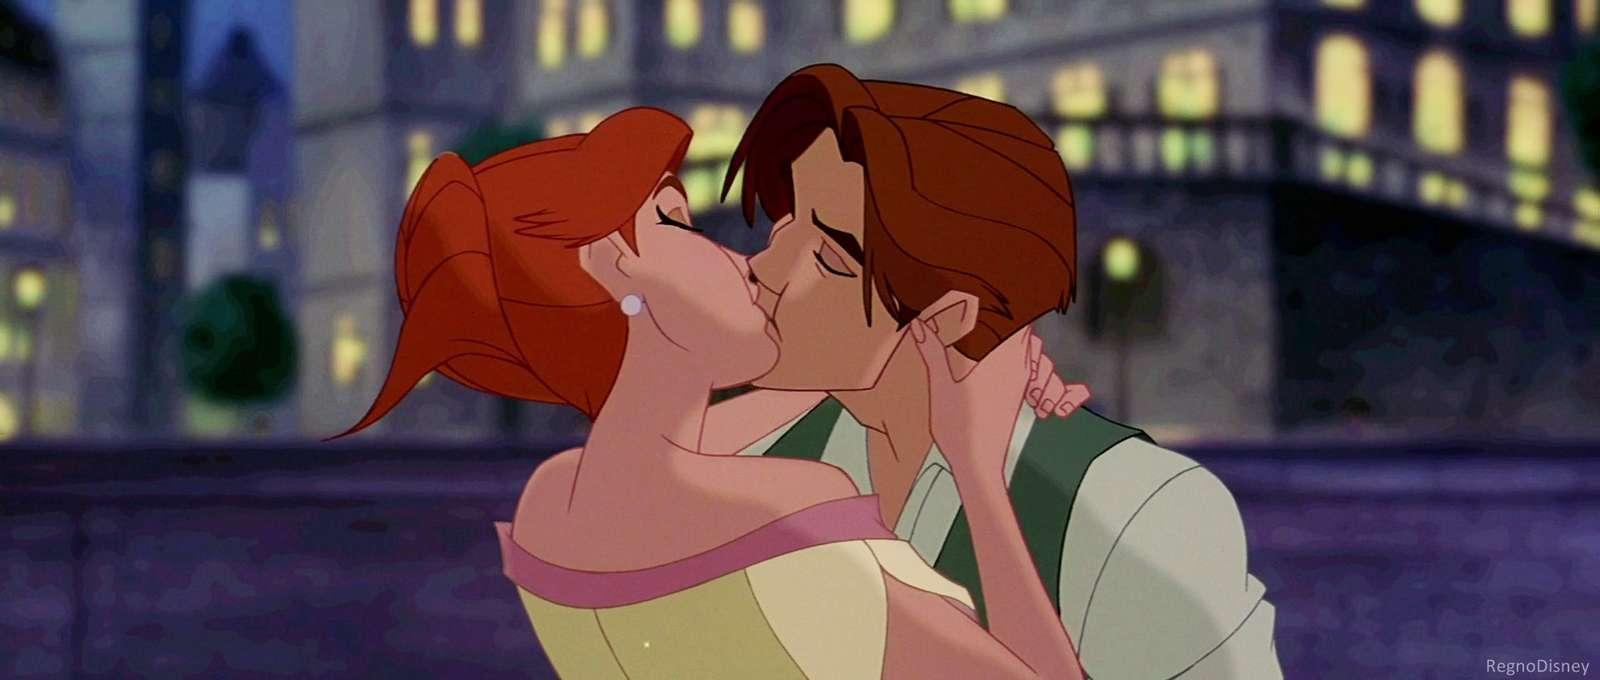 anastasia - anastasia and dimitri while they kiss at the end (12×9)